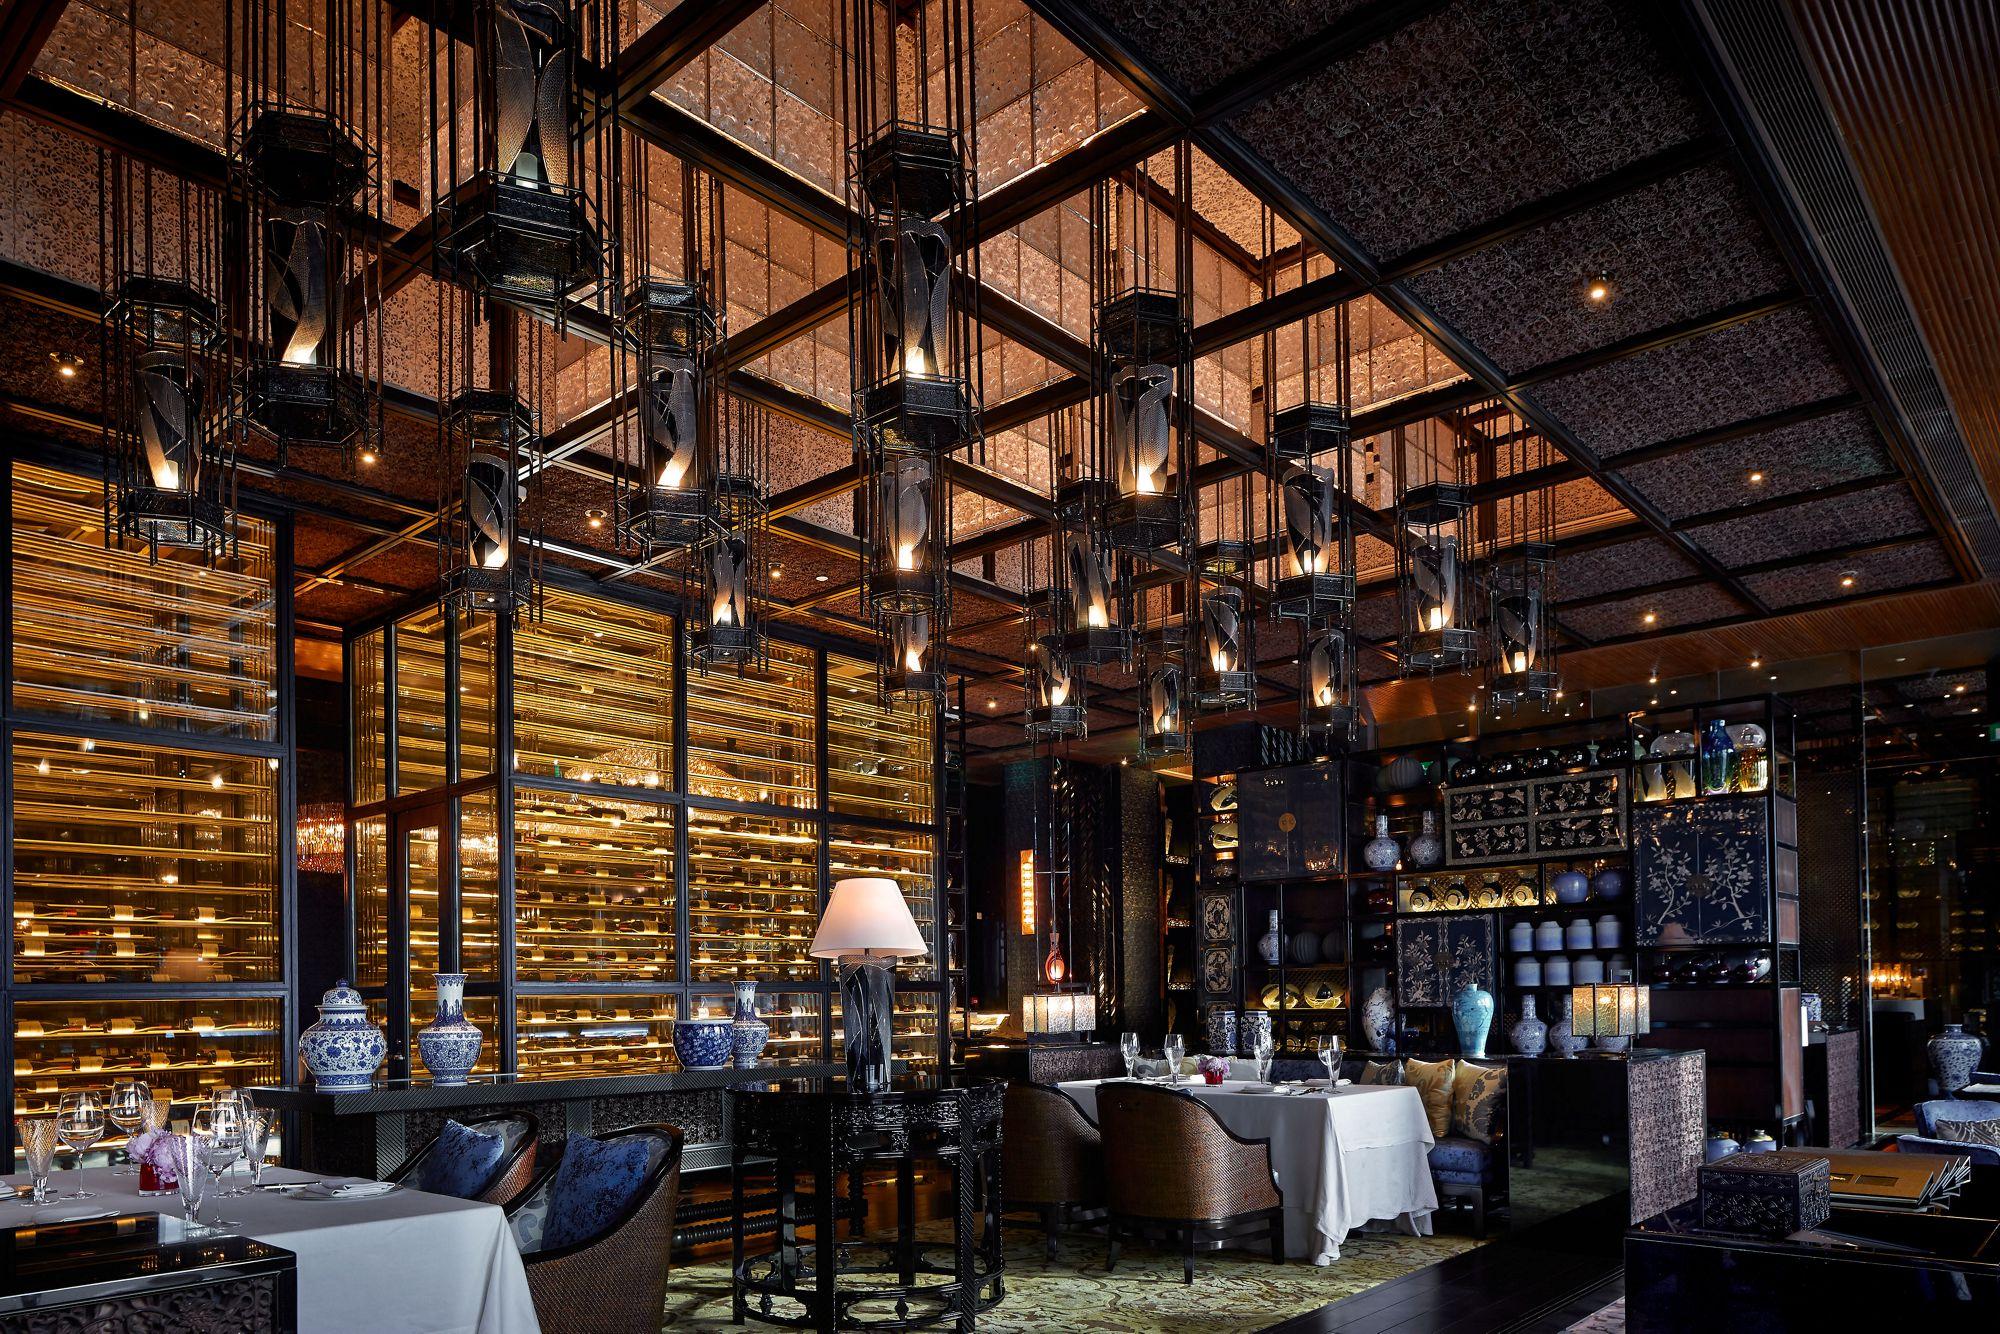 Michelin Star Restaurant In Macau Private Dining The Ritz Carlton Macau